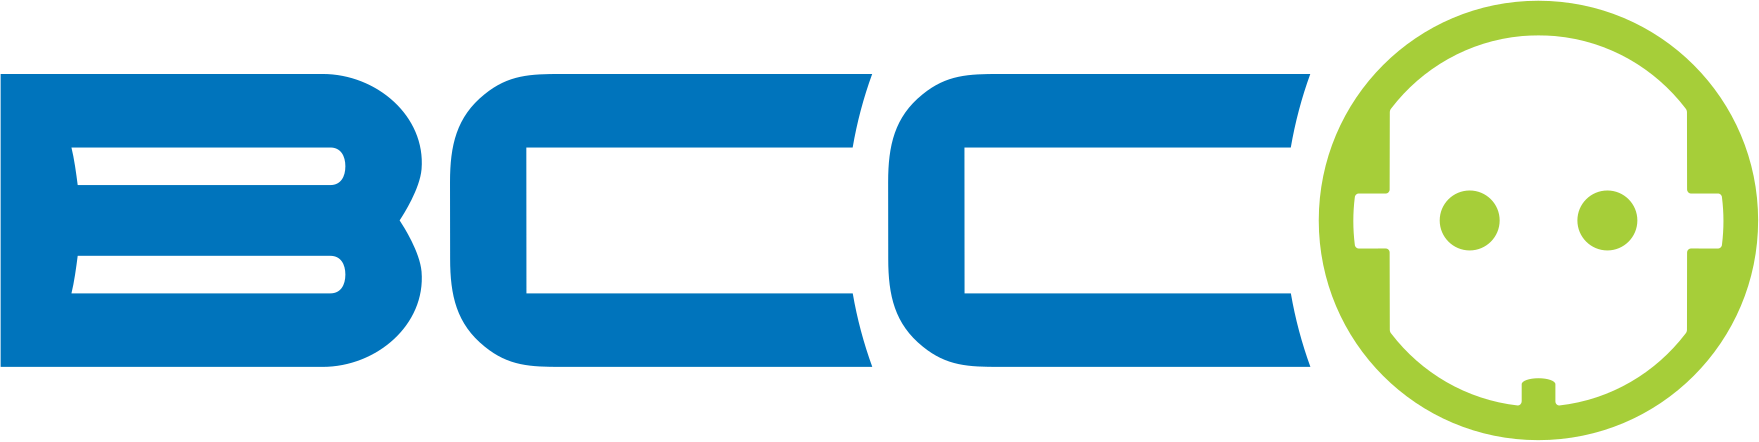 (c) Bcc.nl